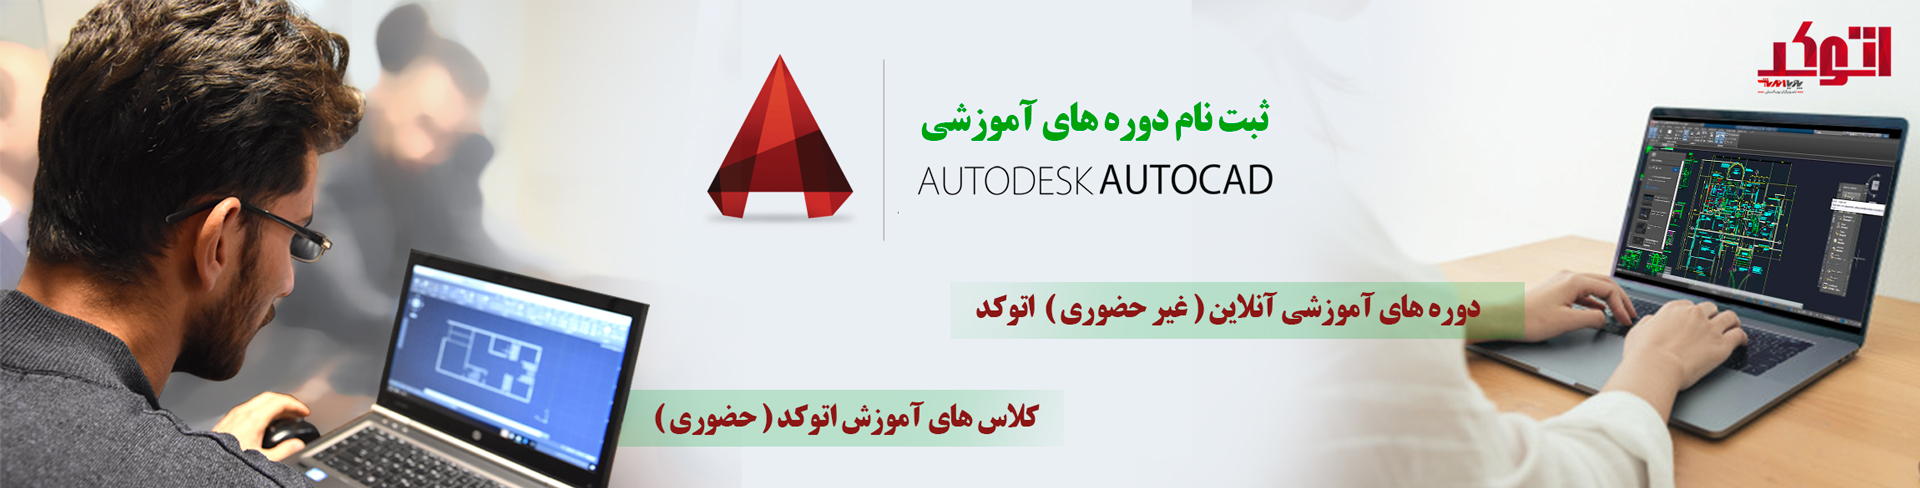 autocad 01 class online pouyaandish hozuri gheyre hozuri - آموزش اتوکد | Autocad